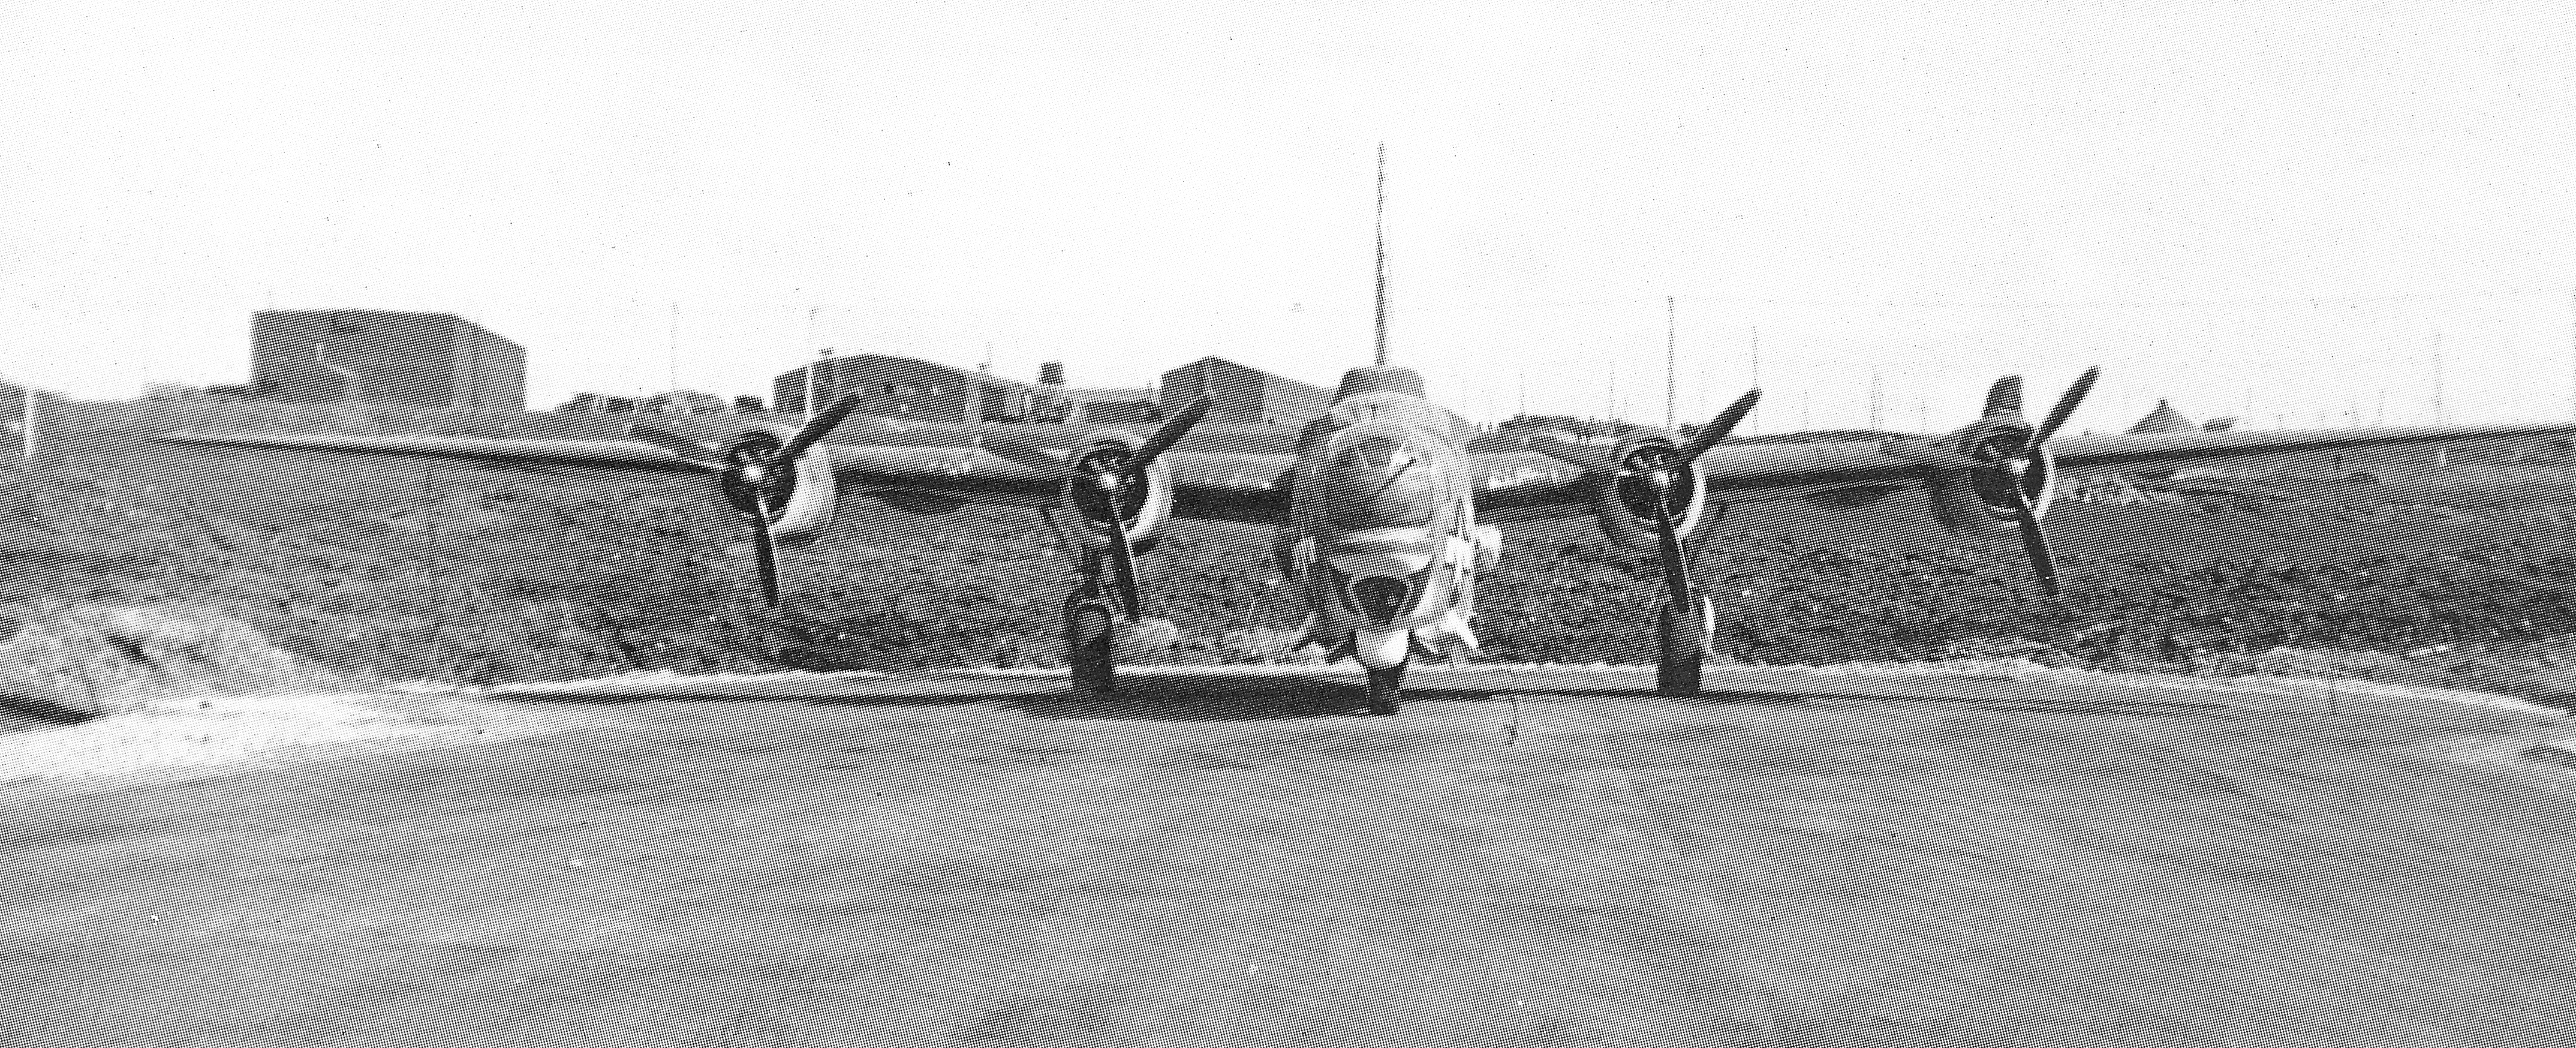 59745 90V  The Black  Sheep VPB-120 Shemya Aleutian Islands 08-1945